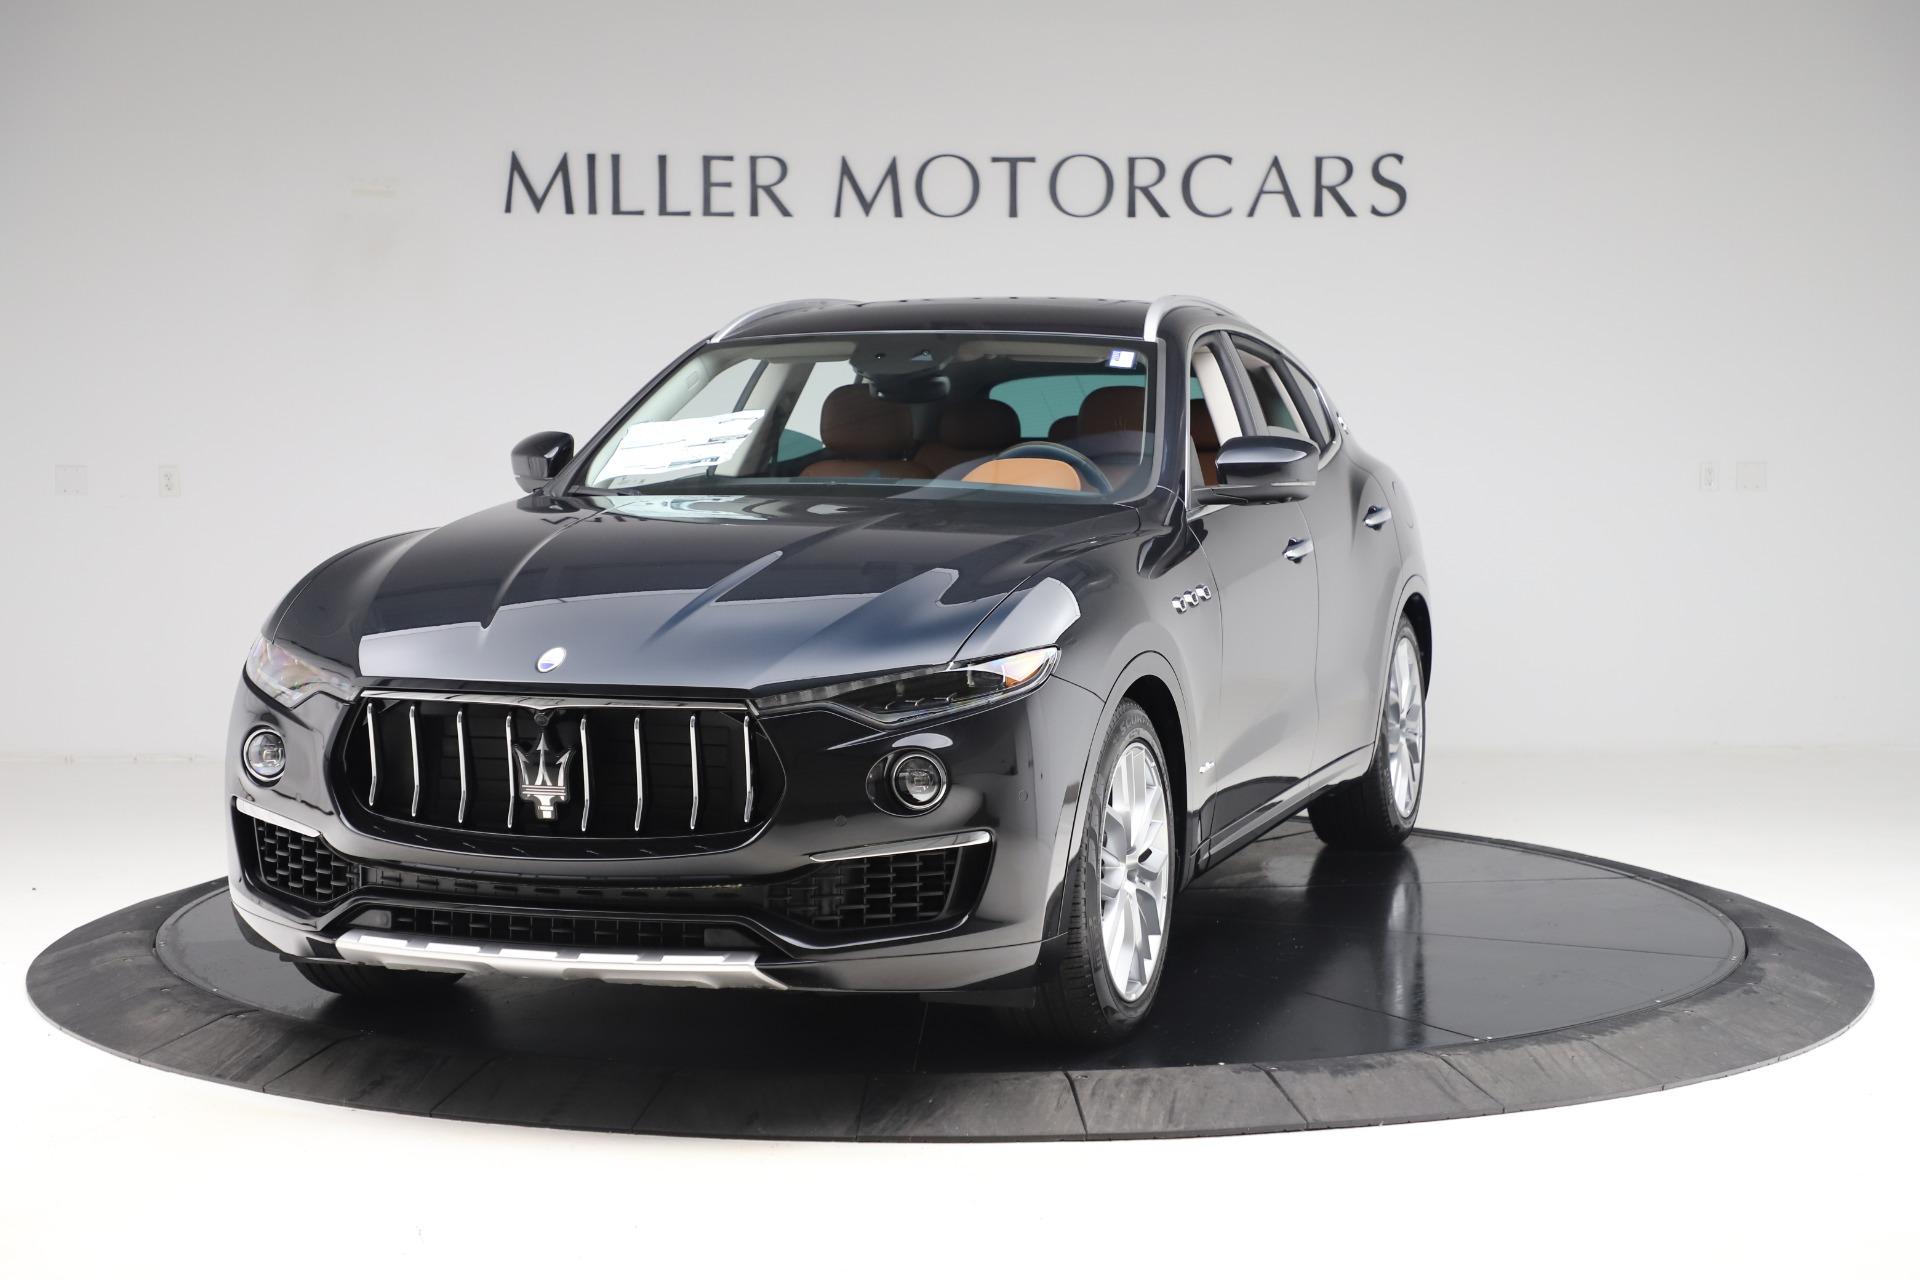 New 2019 Maserati Levante Q4 GranLusso for sale $89,550 at Bentley Greenwich in Greenwich CT 06830 1